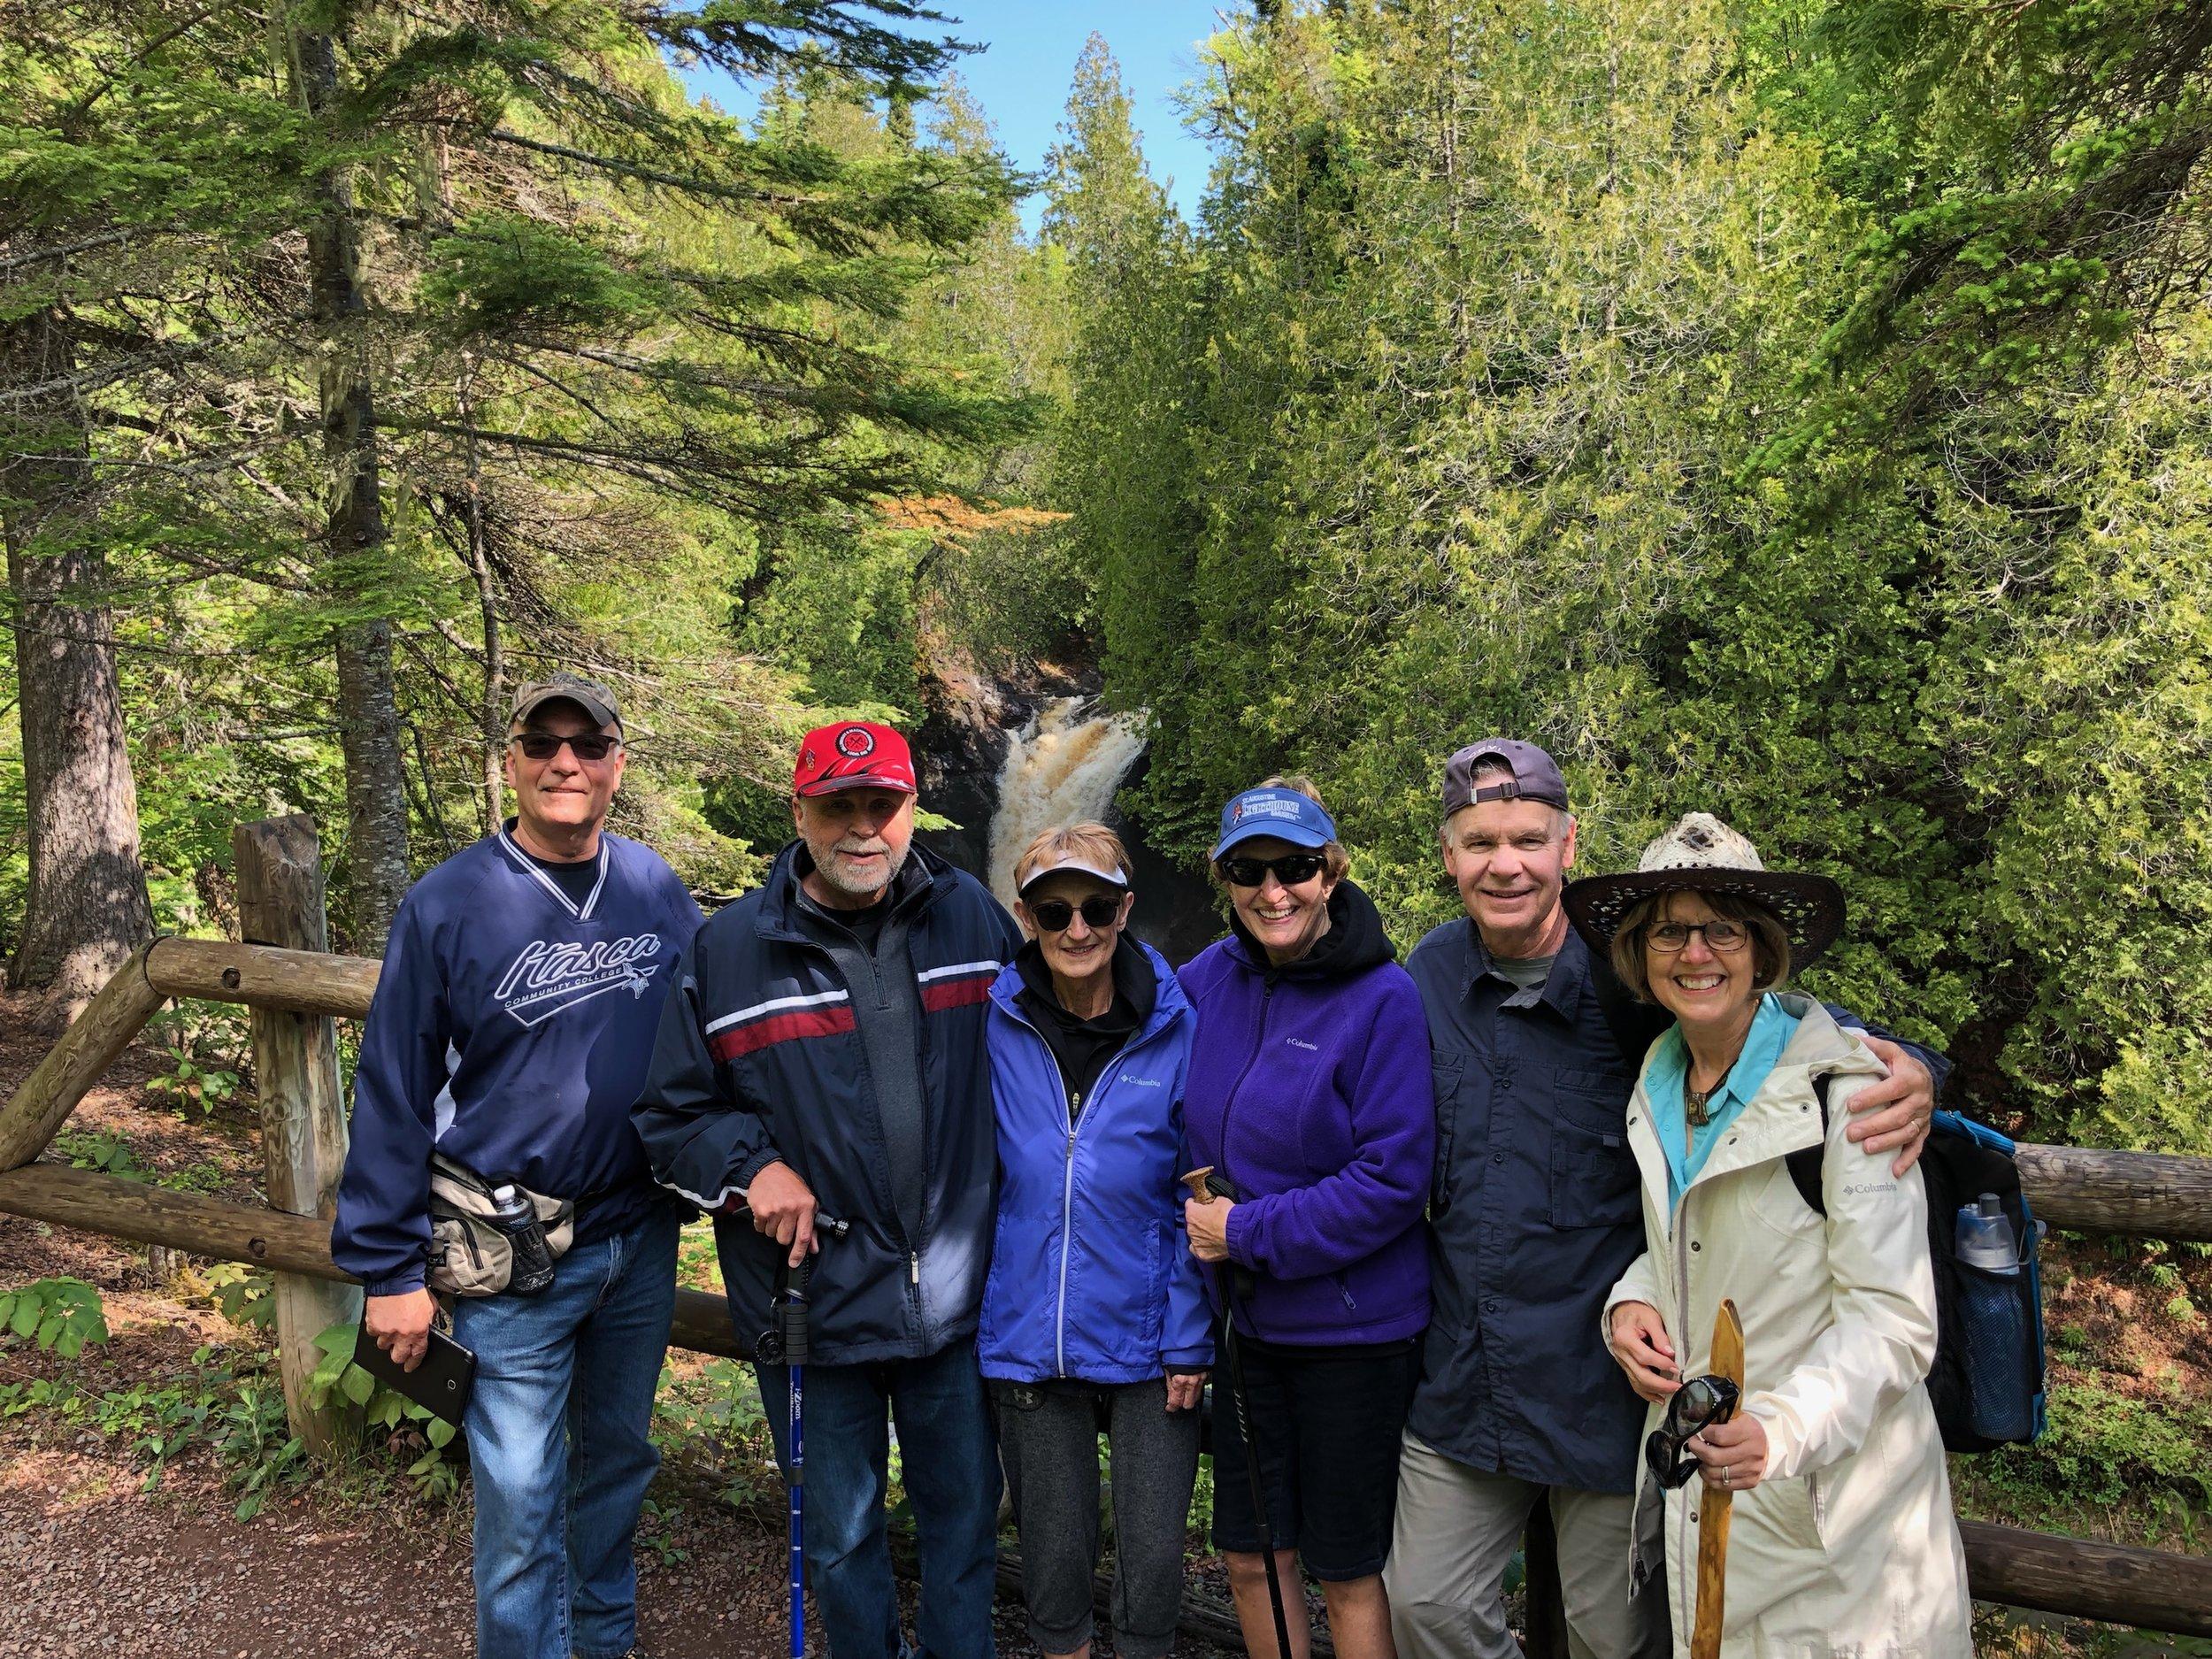 Minnesota North Shore: Sixpack of Hikers